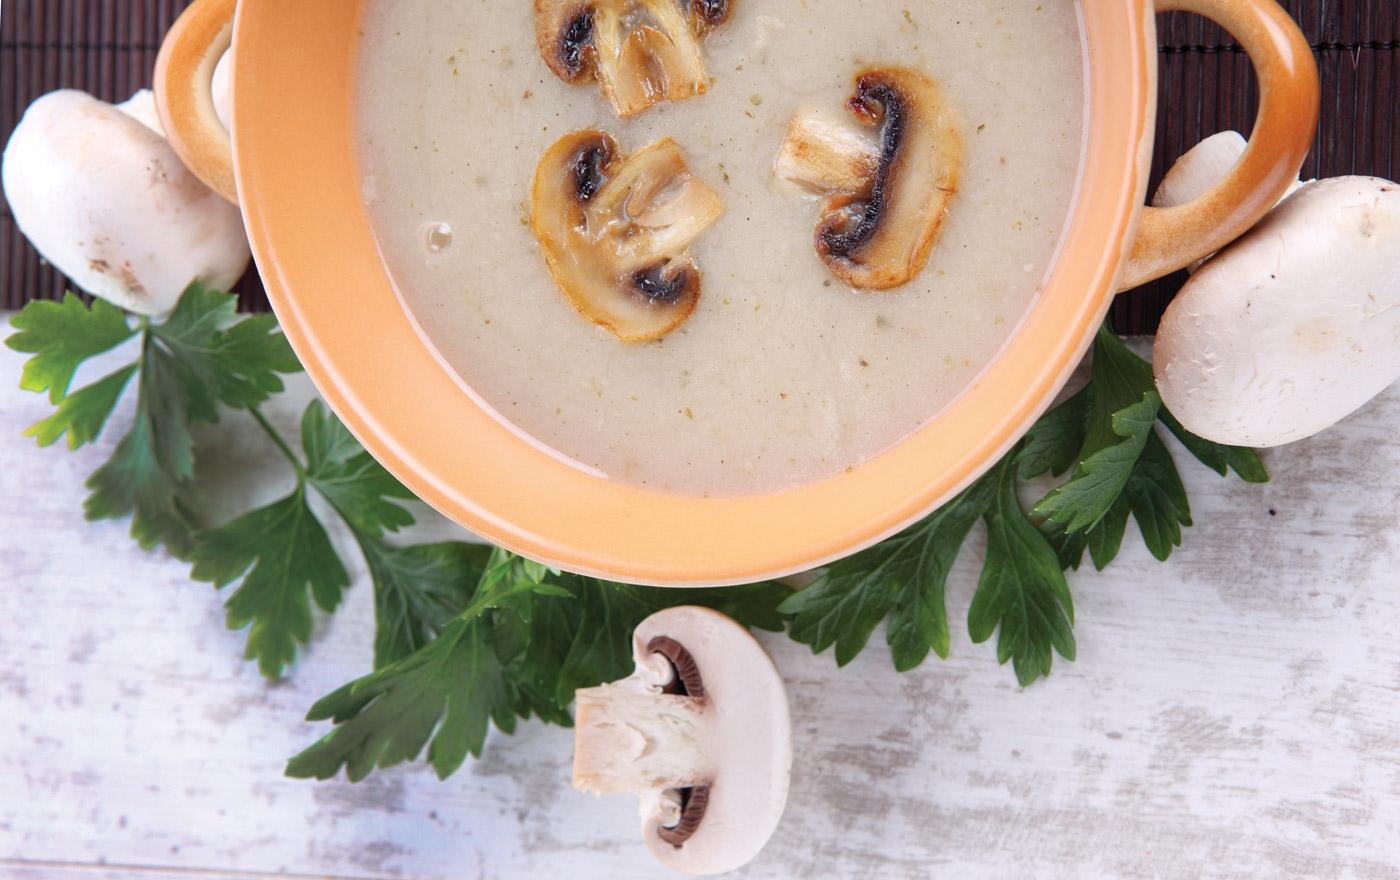 Skinny 'Cream' of<br>Mushroom Soup